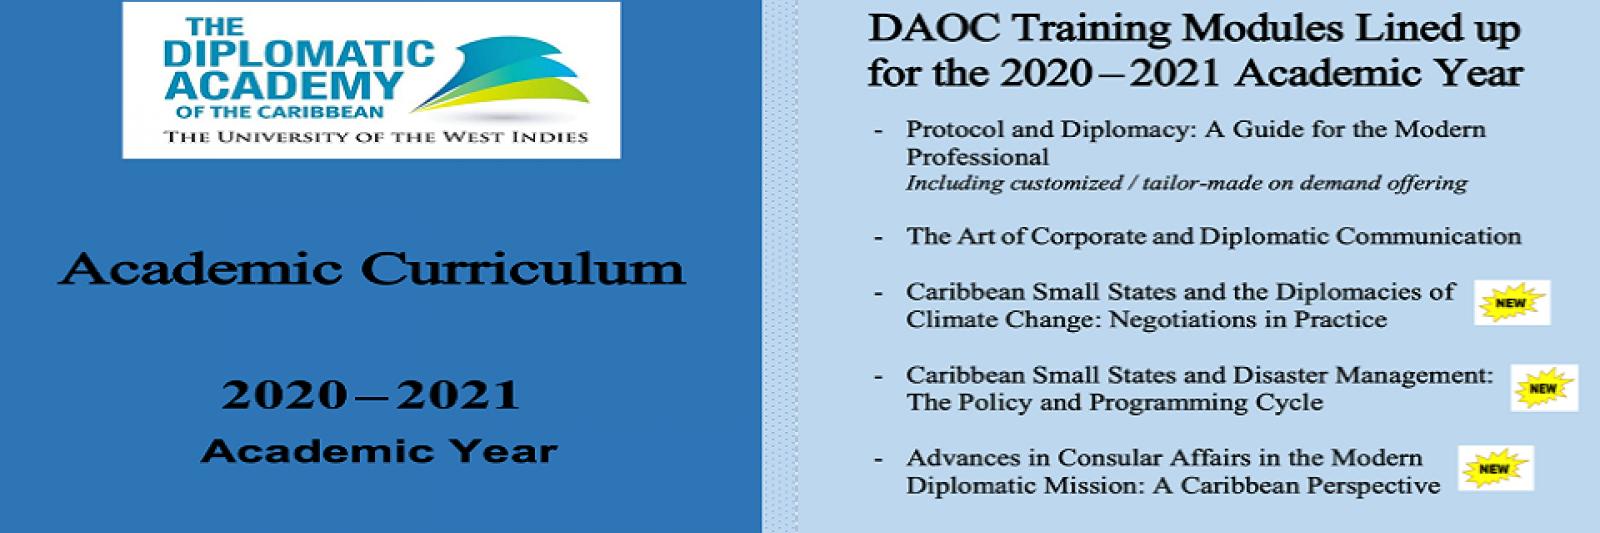 DAOC Academic Curriculum: 2020 – 2021 Academic Year